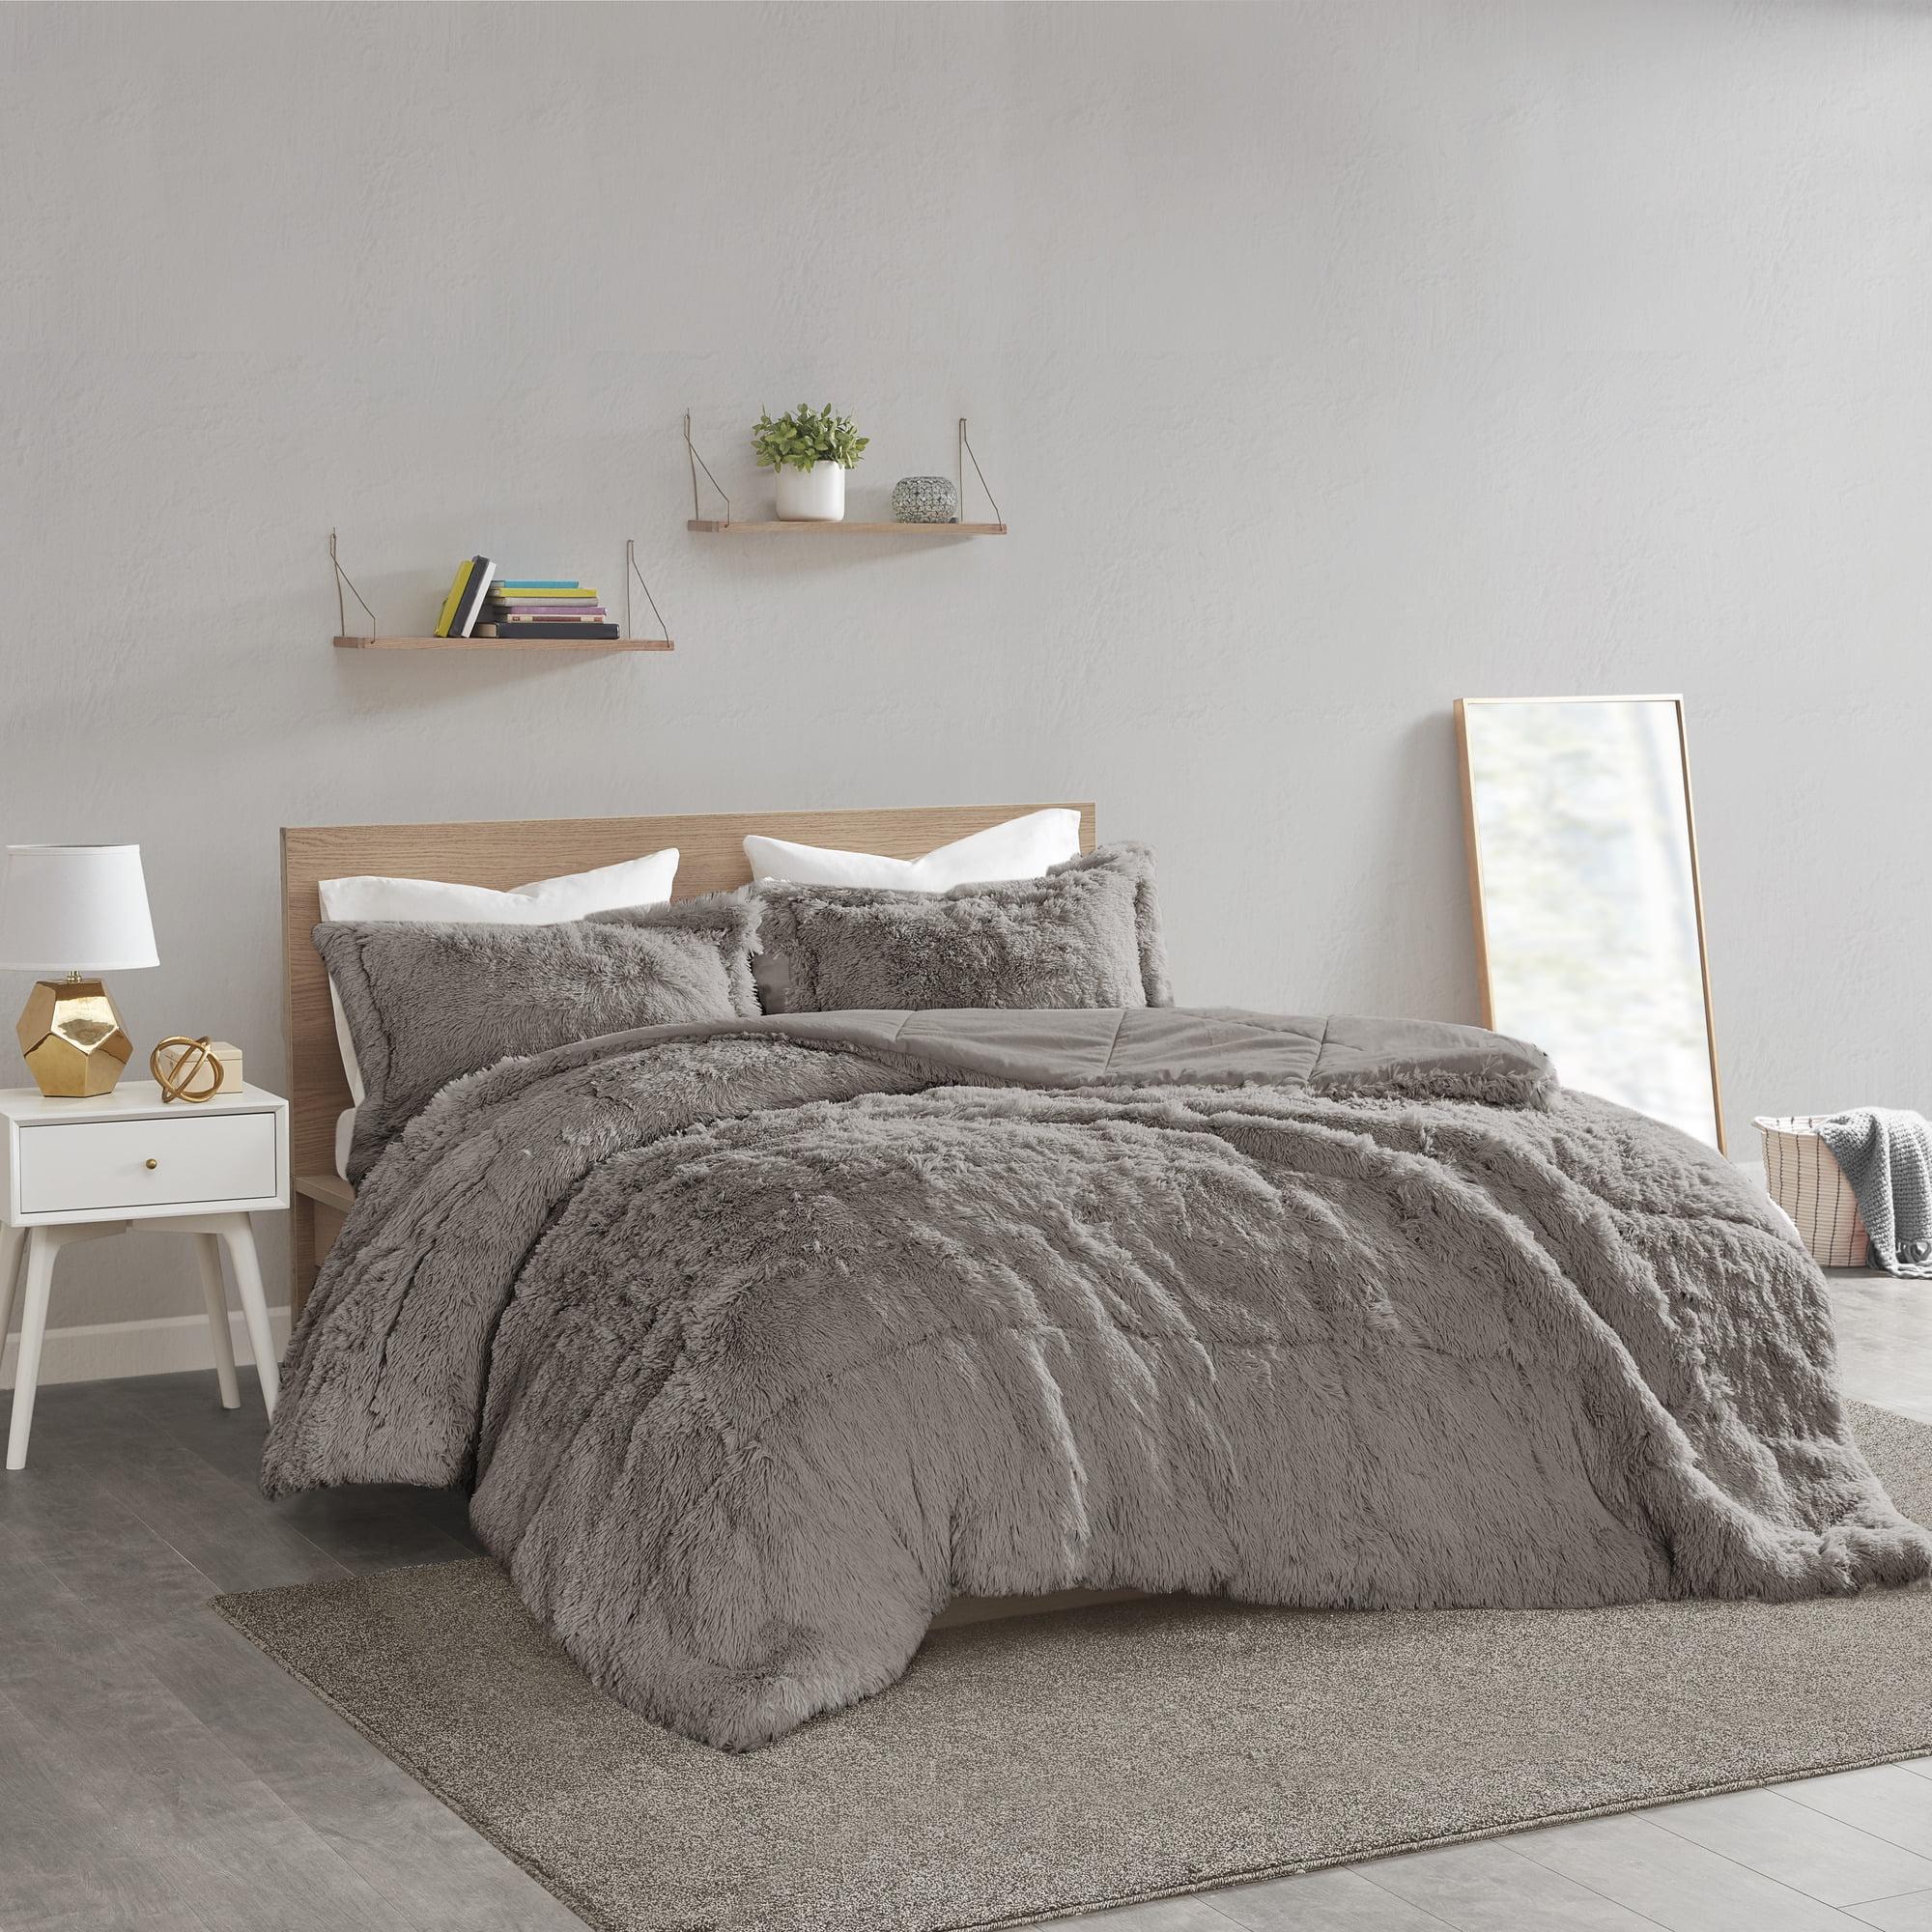 Home Essence Apartment Leena Shaggy Faux Fur Comforter Set, Full/Queen, Grey